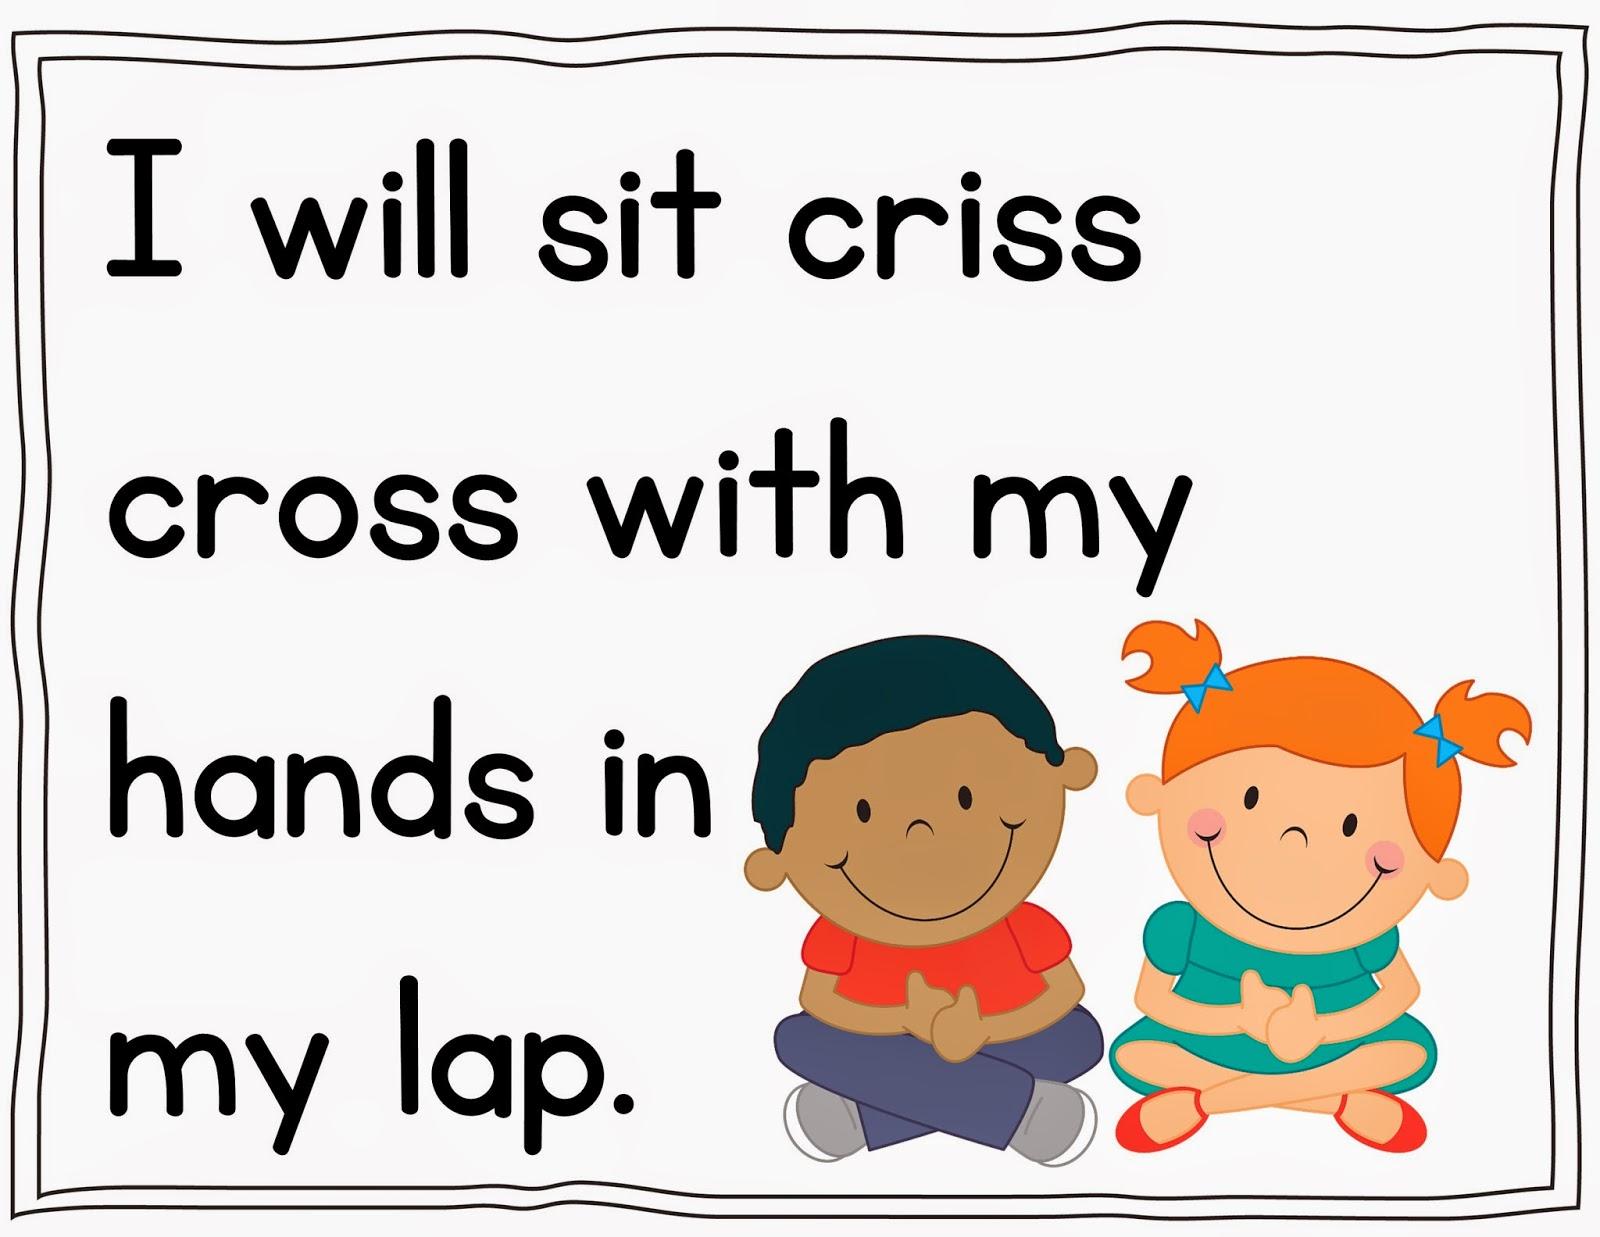 Rules Clipart Preschool Picture 3132584 Rules Clipart Preschool